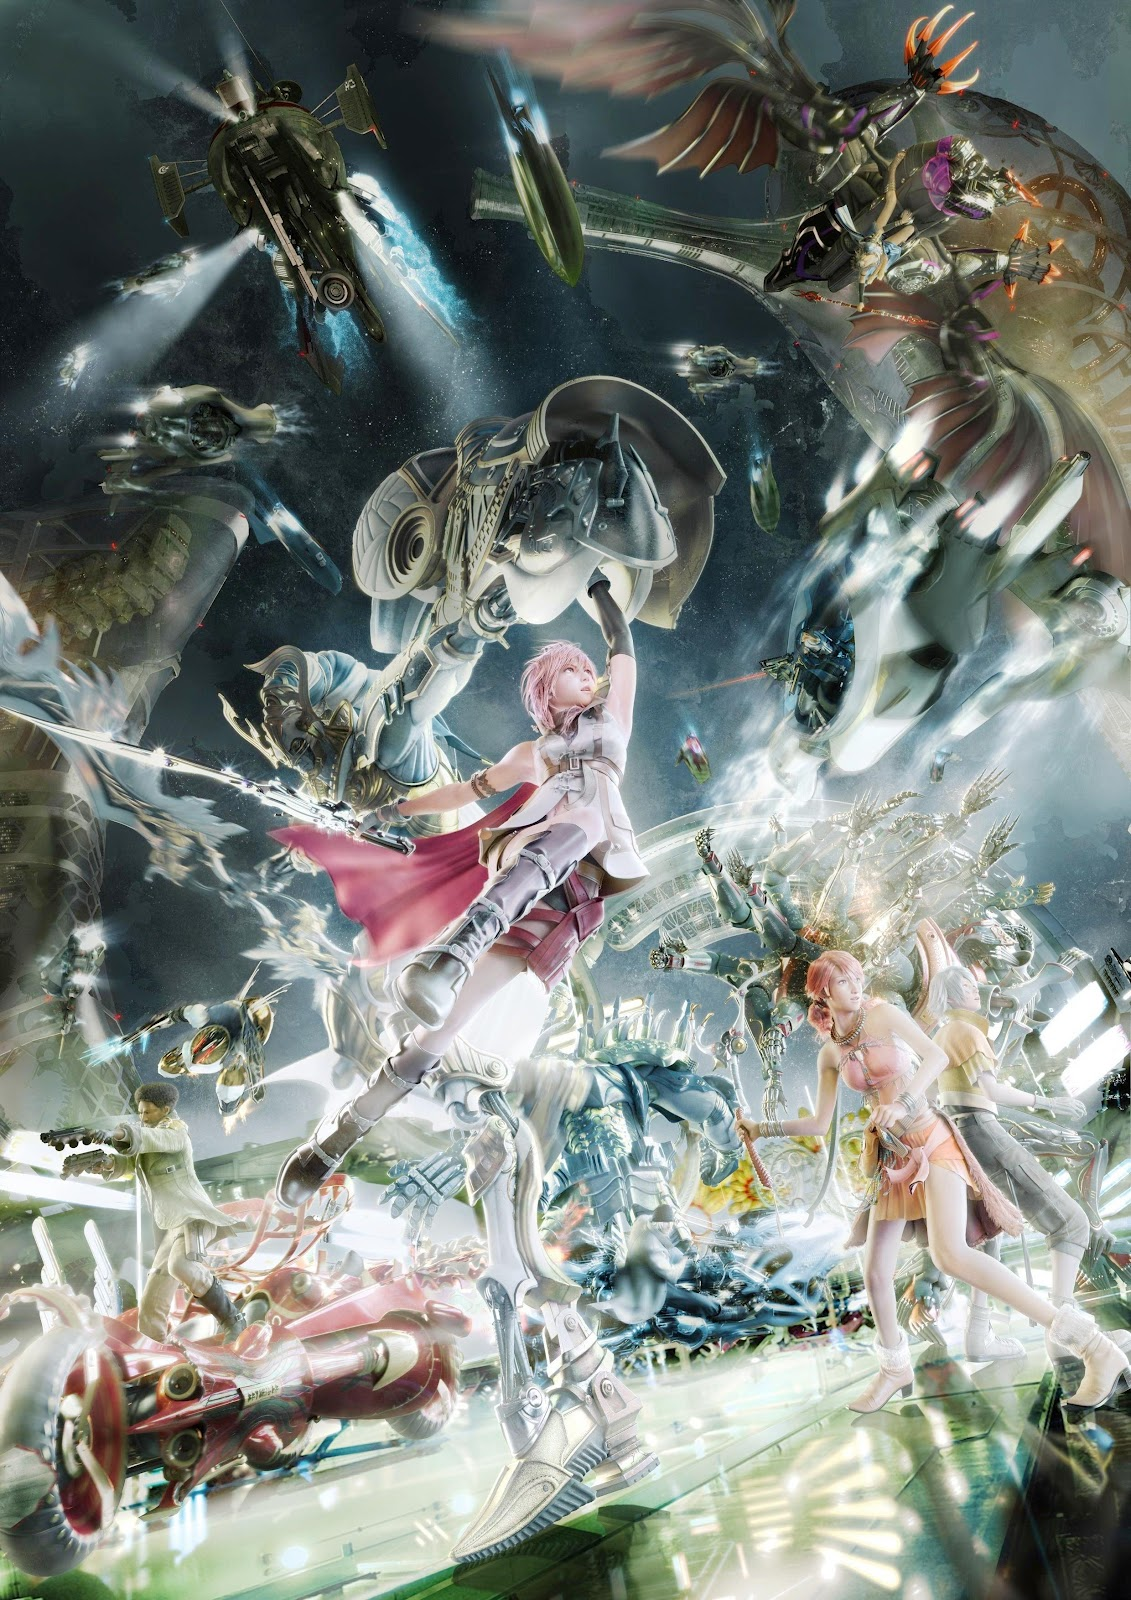 Final Fantasy XIII Wallpaper (70+ images)